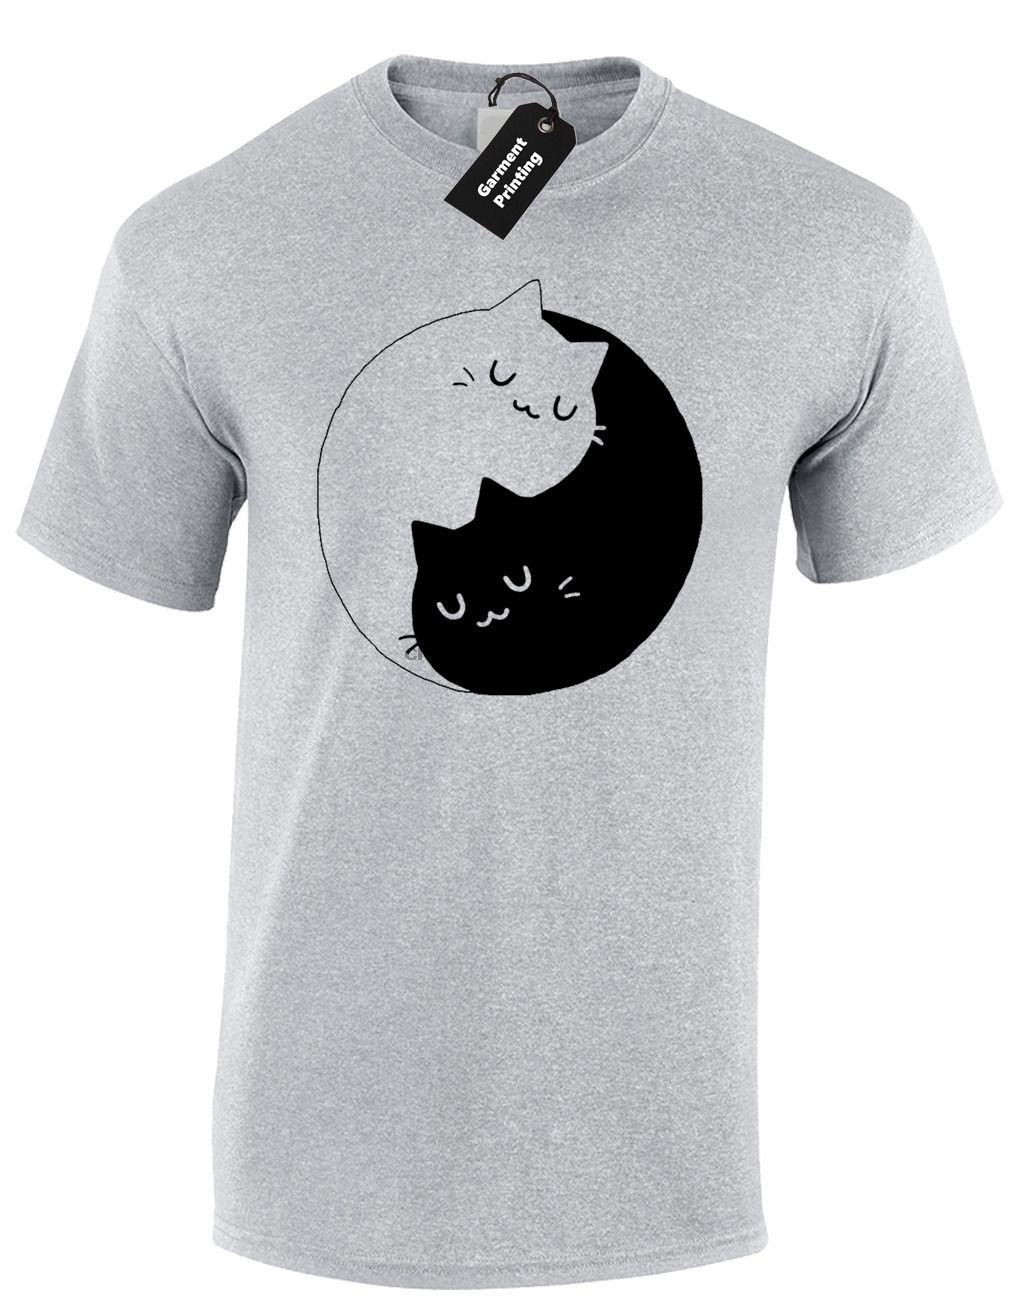 Котята Ying Yang Унисекс футболка Cat Lover Забавный дизайн Top Instagram S - 5xl